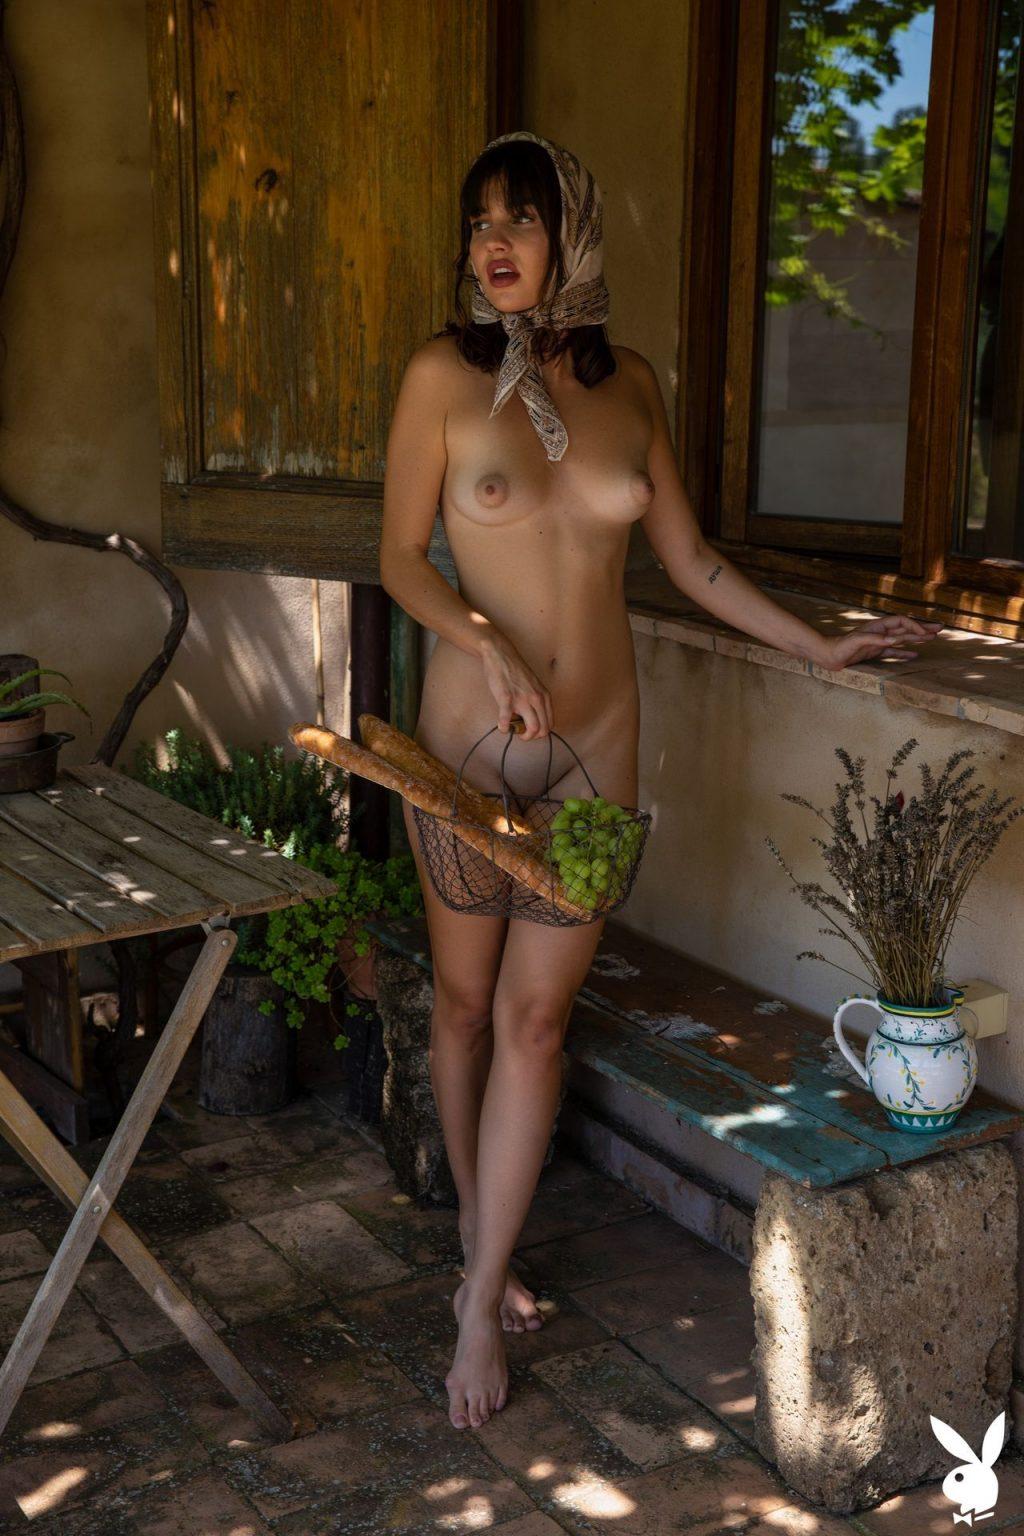 Laura Devushcat Nude – Countryside Escape (34 Photos + GIFs & Video)